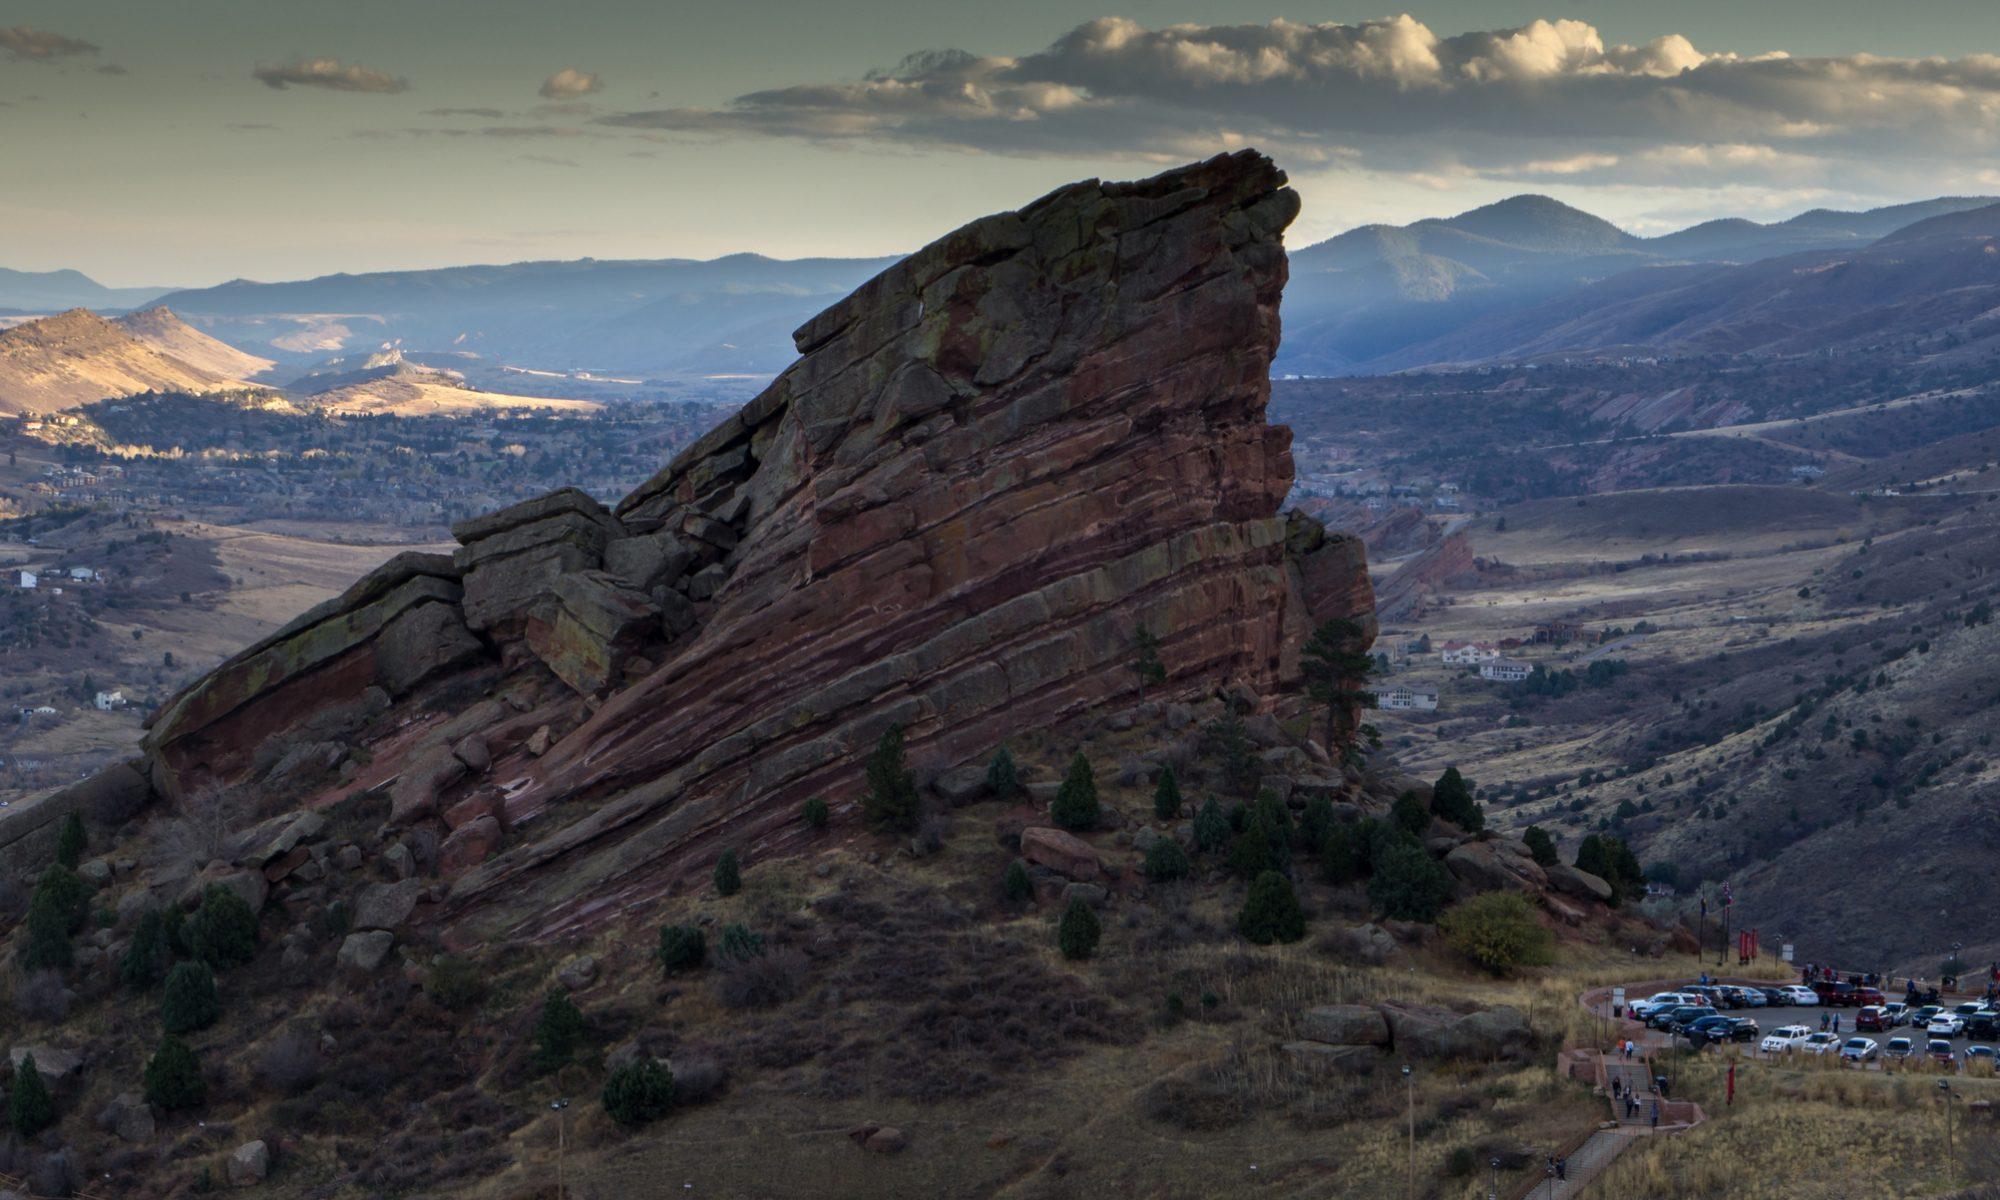 Colorado Artist Spotlight: The Czars